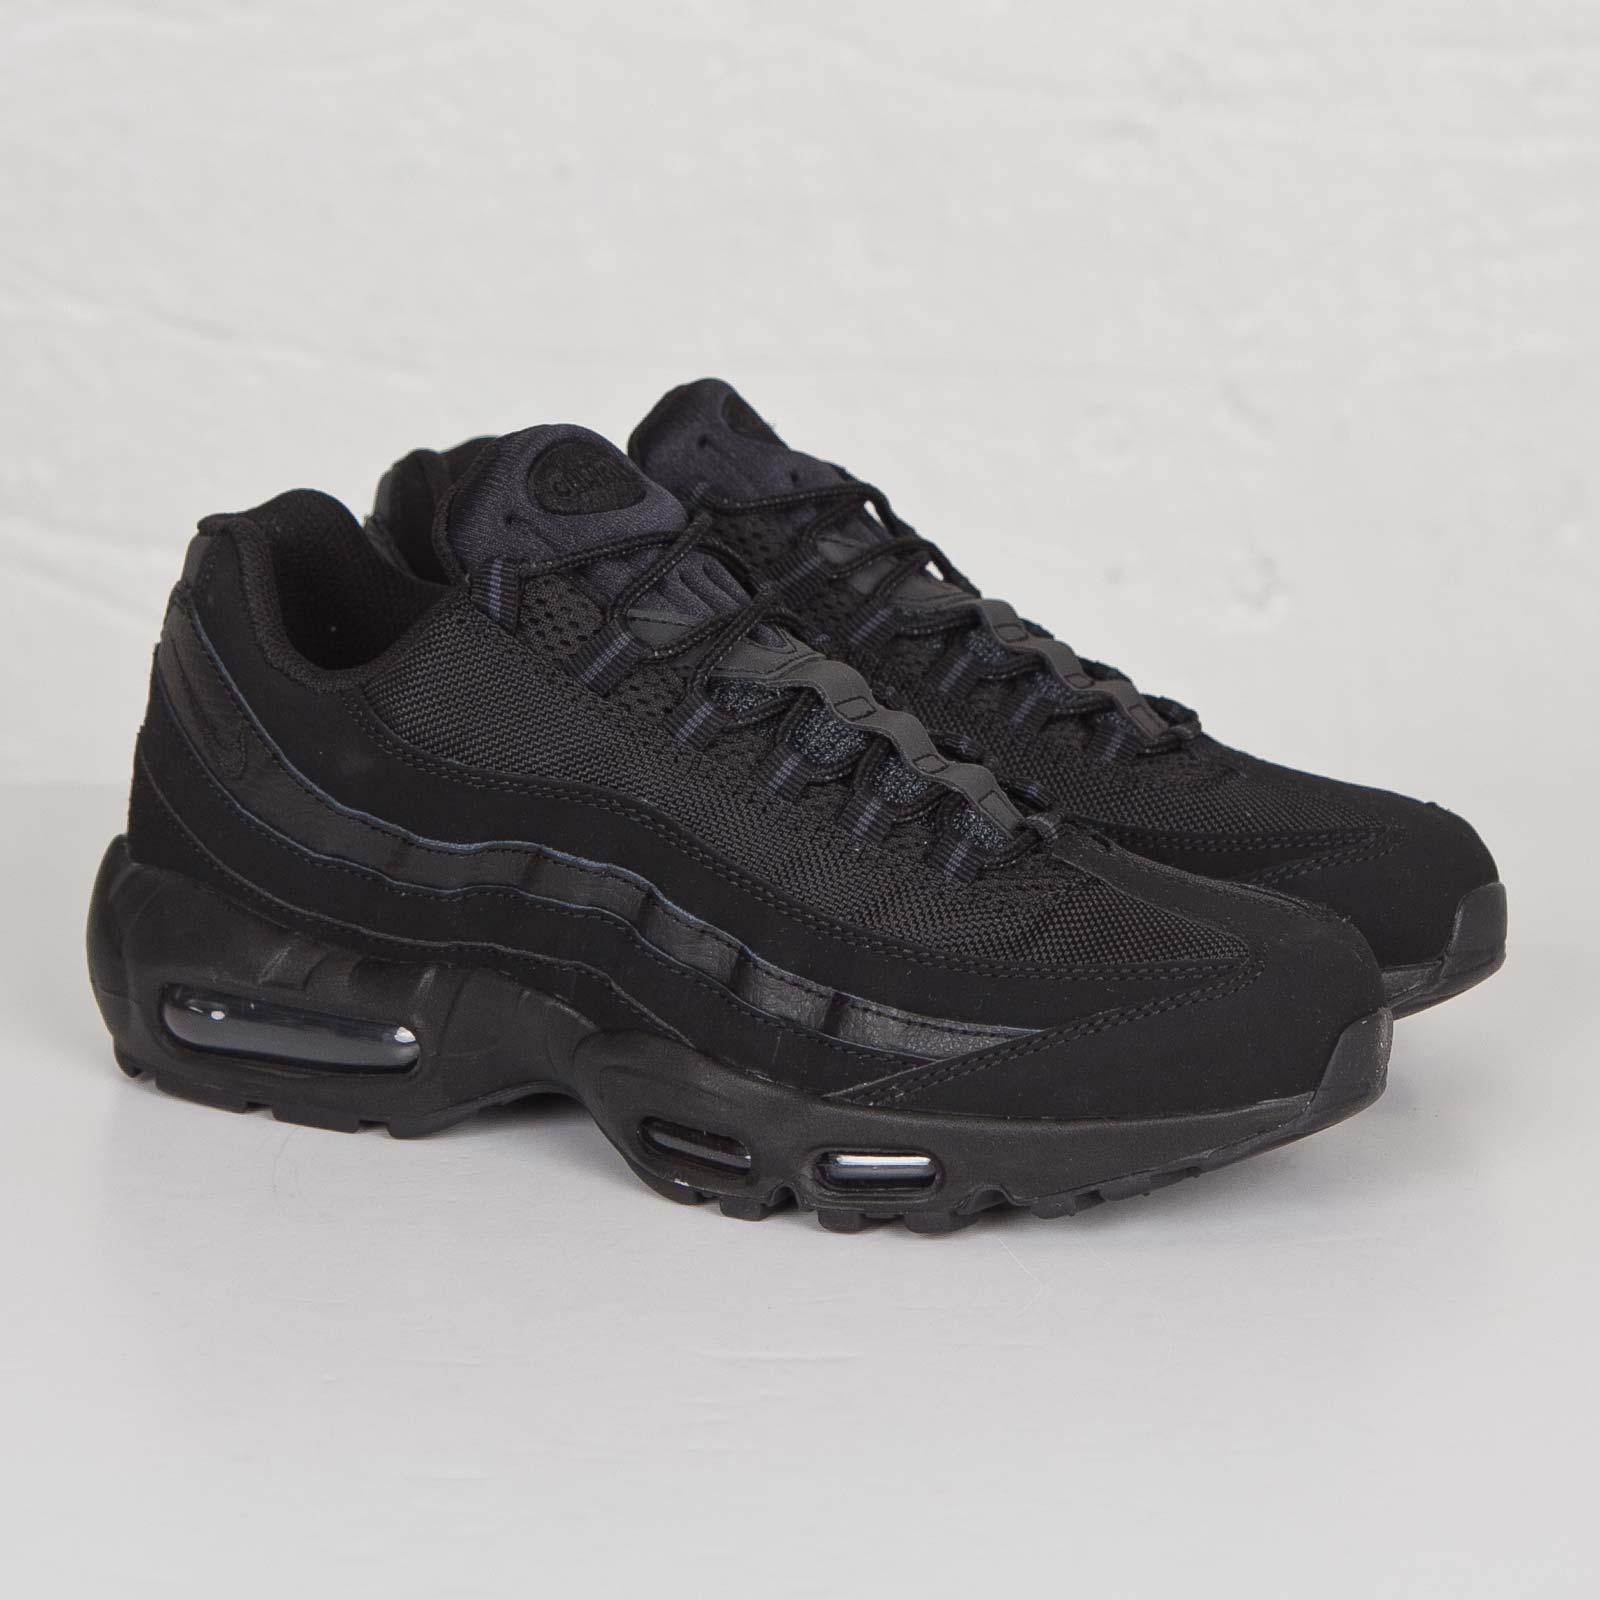 best service 29240 3152e Nike Air Max 95 - 609048-092 - Sneakersnstuff   sneakers ...